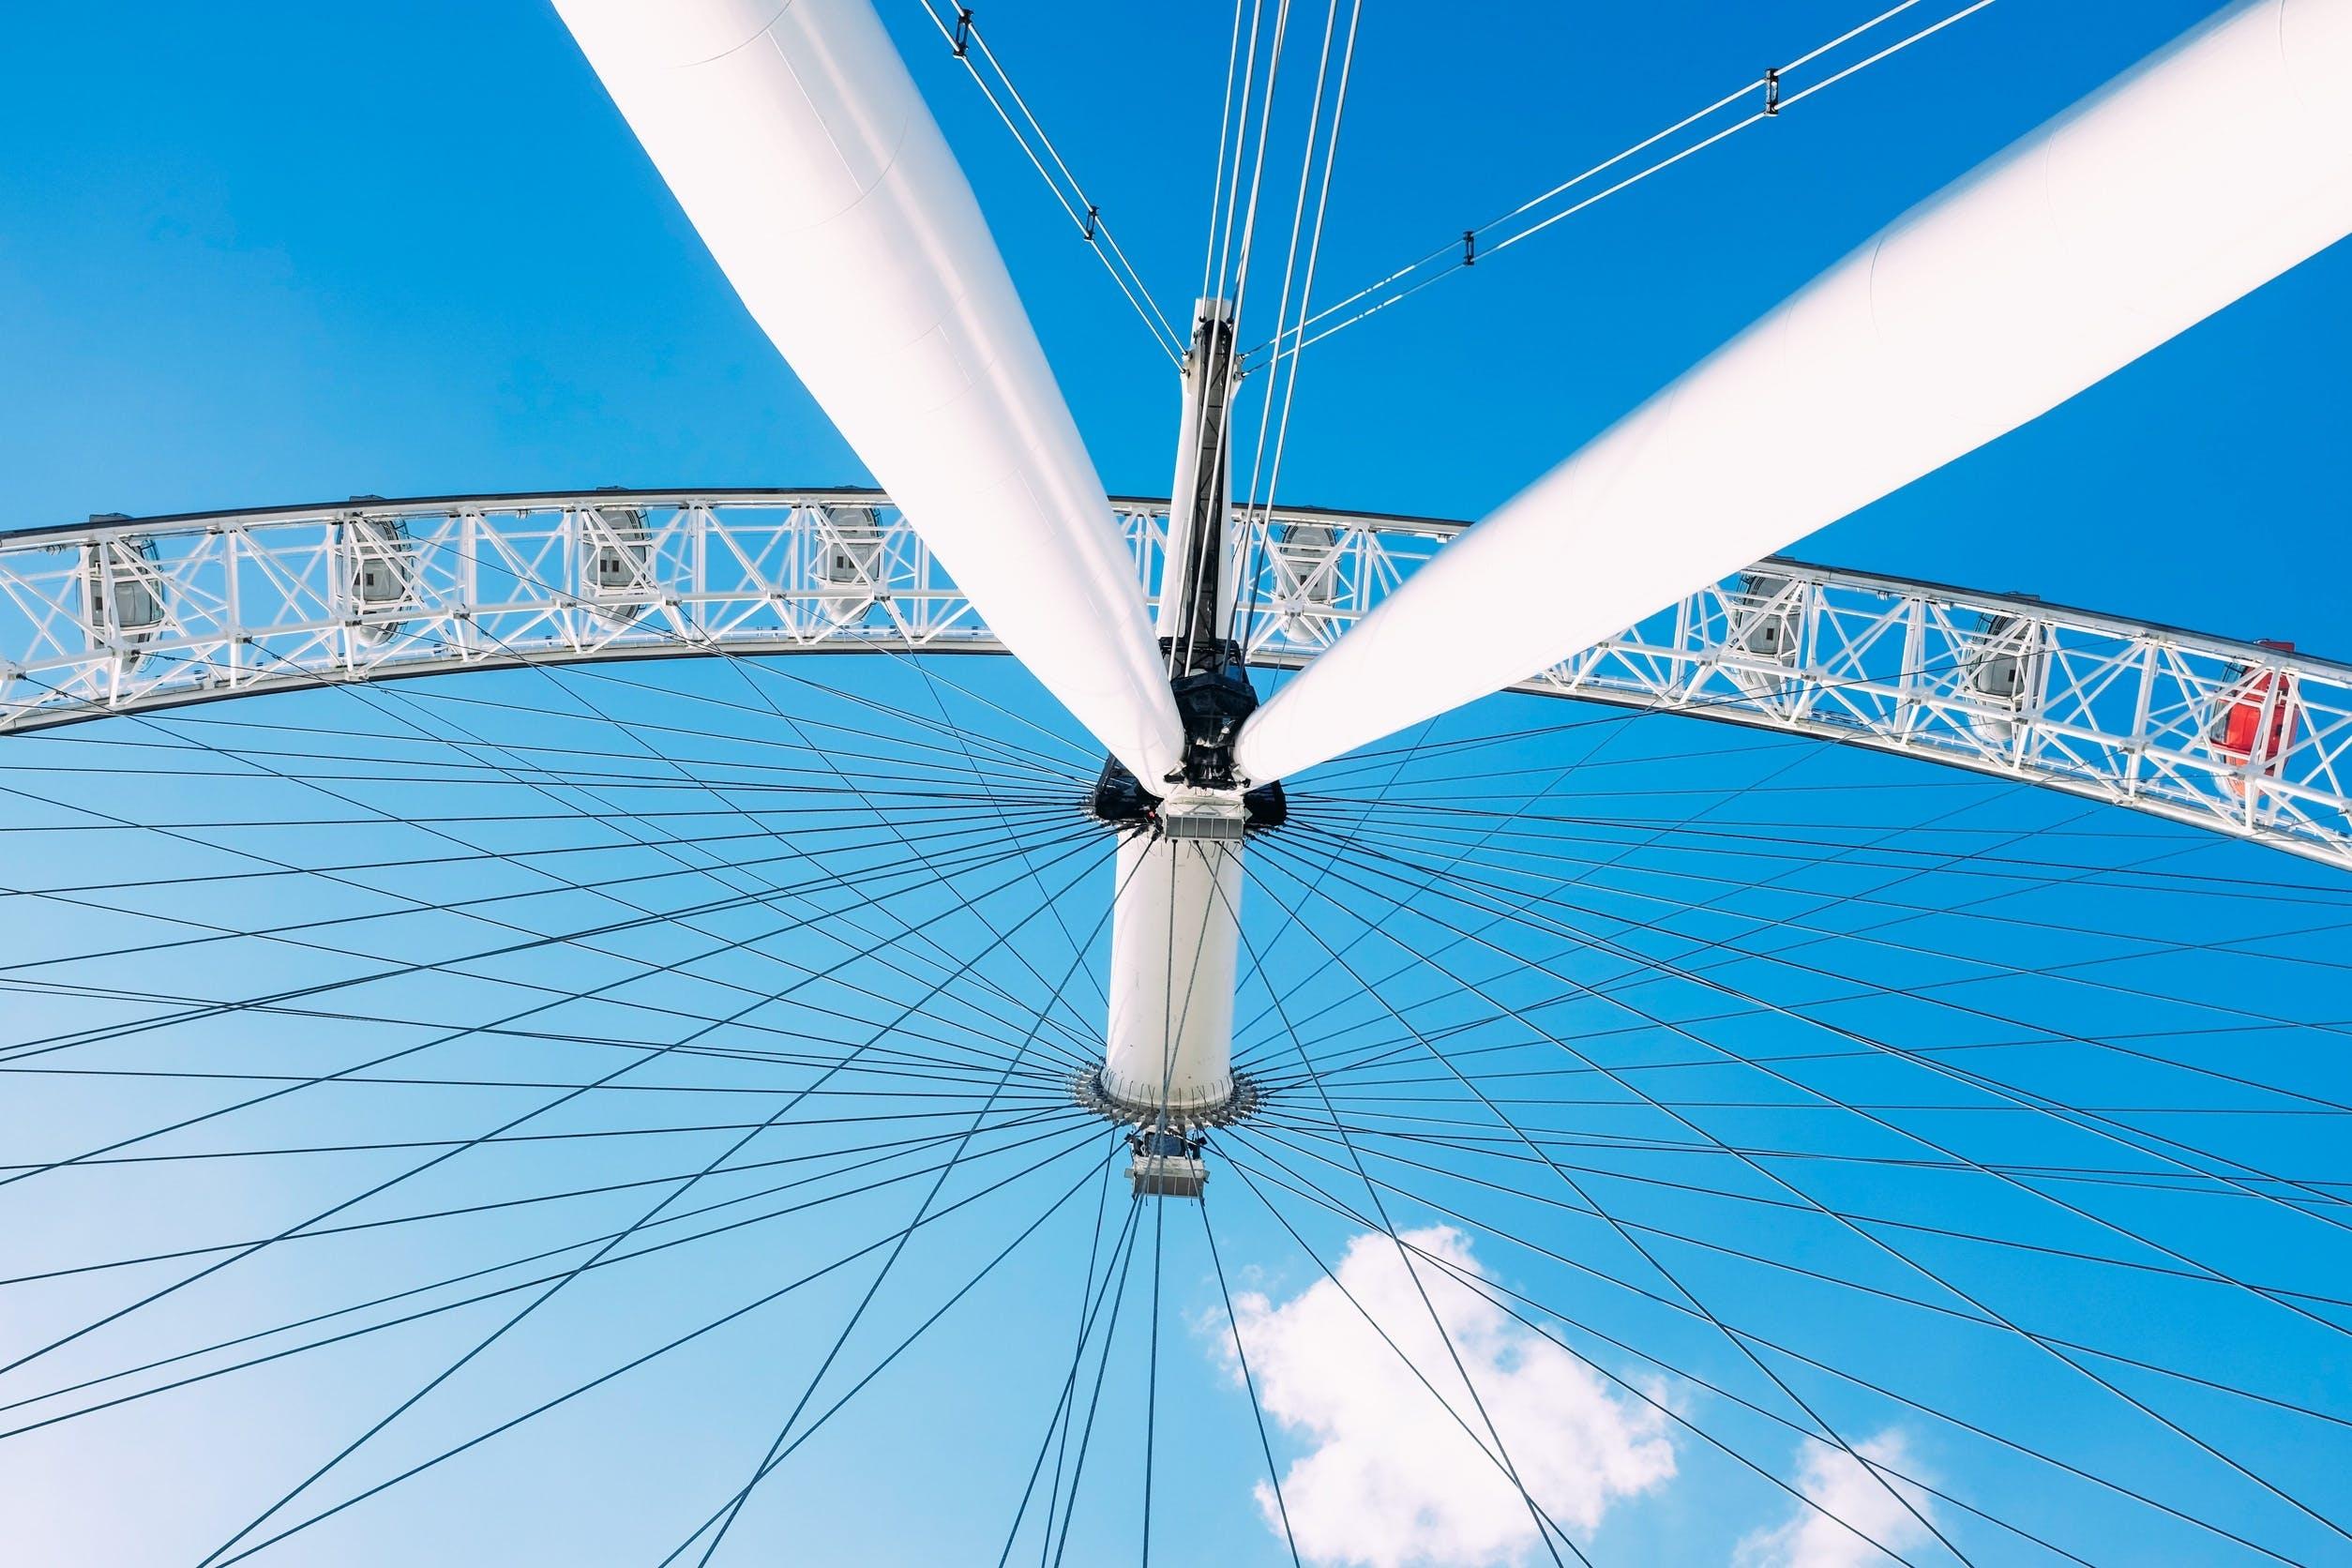 Free stock photo of sky, blue, festival, ferris wheel